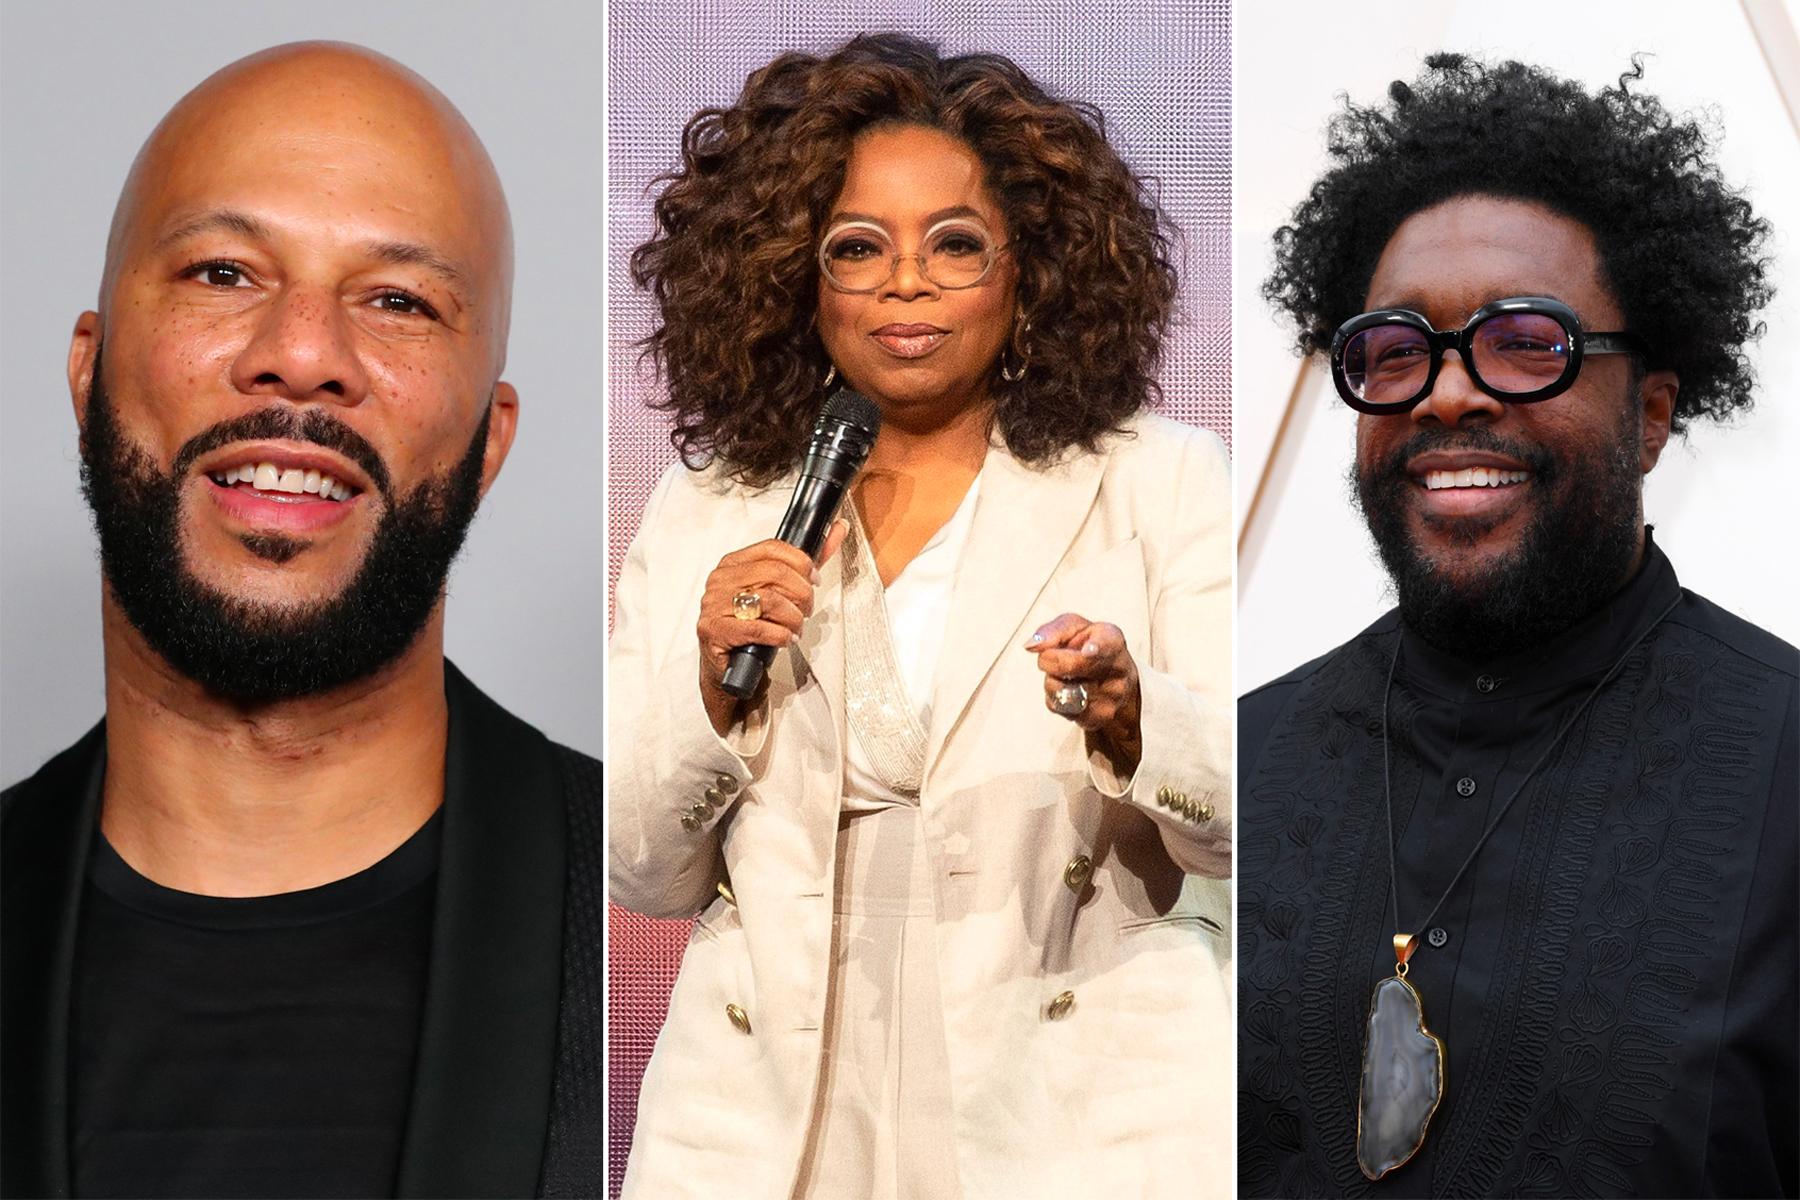 Oprah Winfrey, Questlove, Common Join 'Call to Unite' 24-Hour Livestream - EpicNews